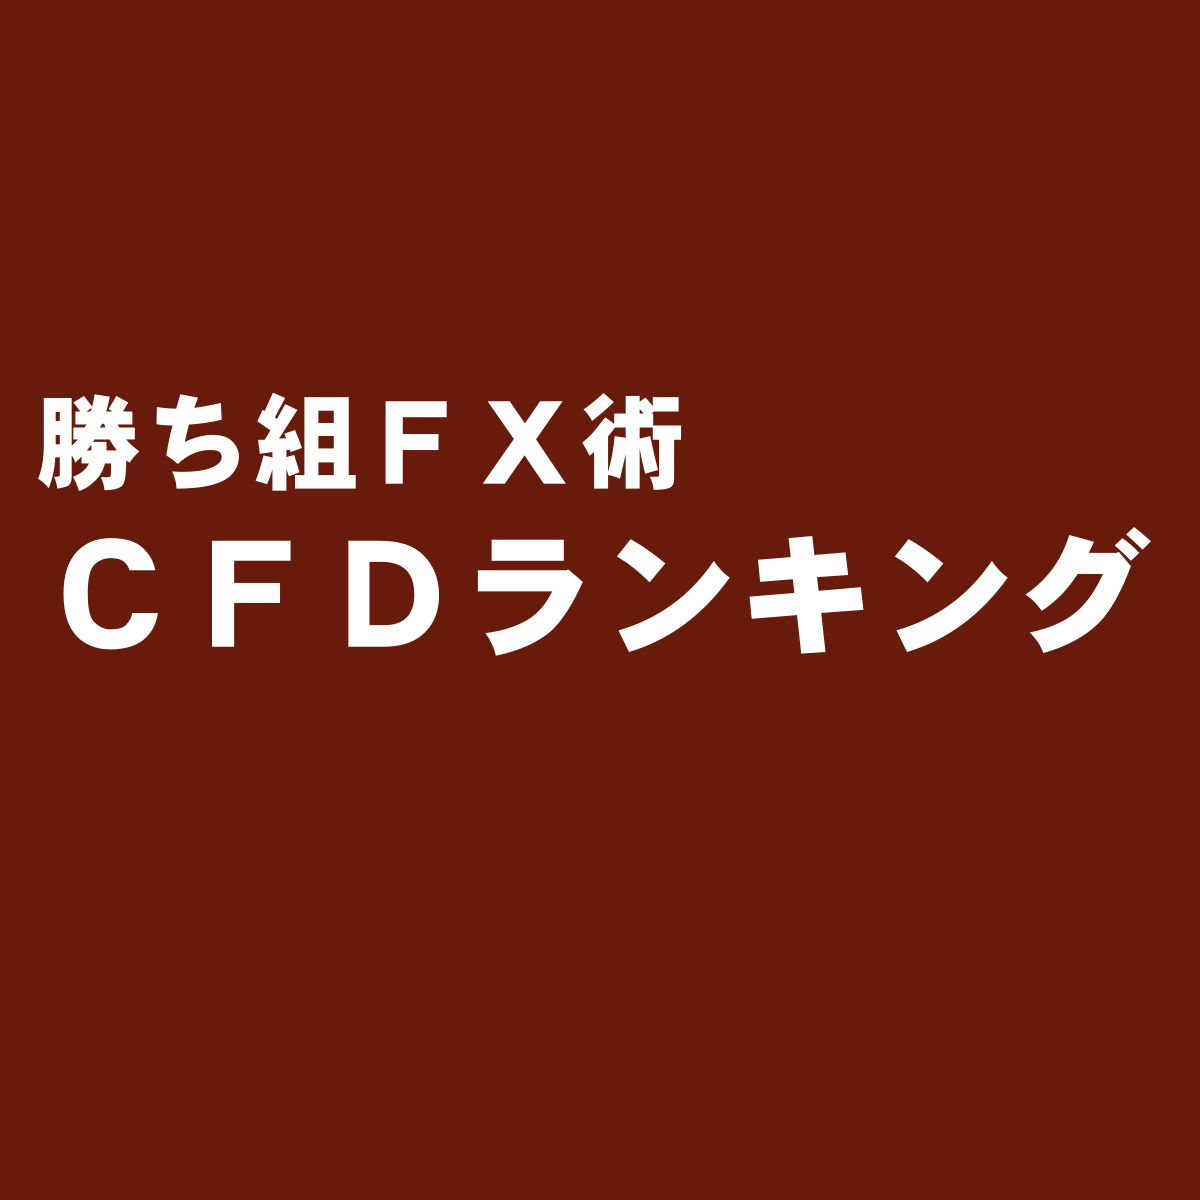 CFDランキング